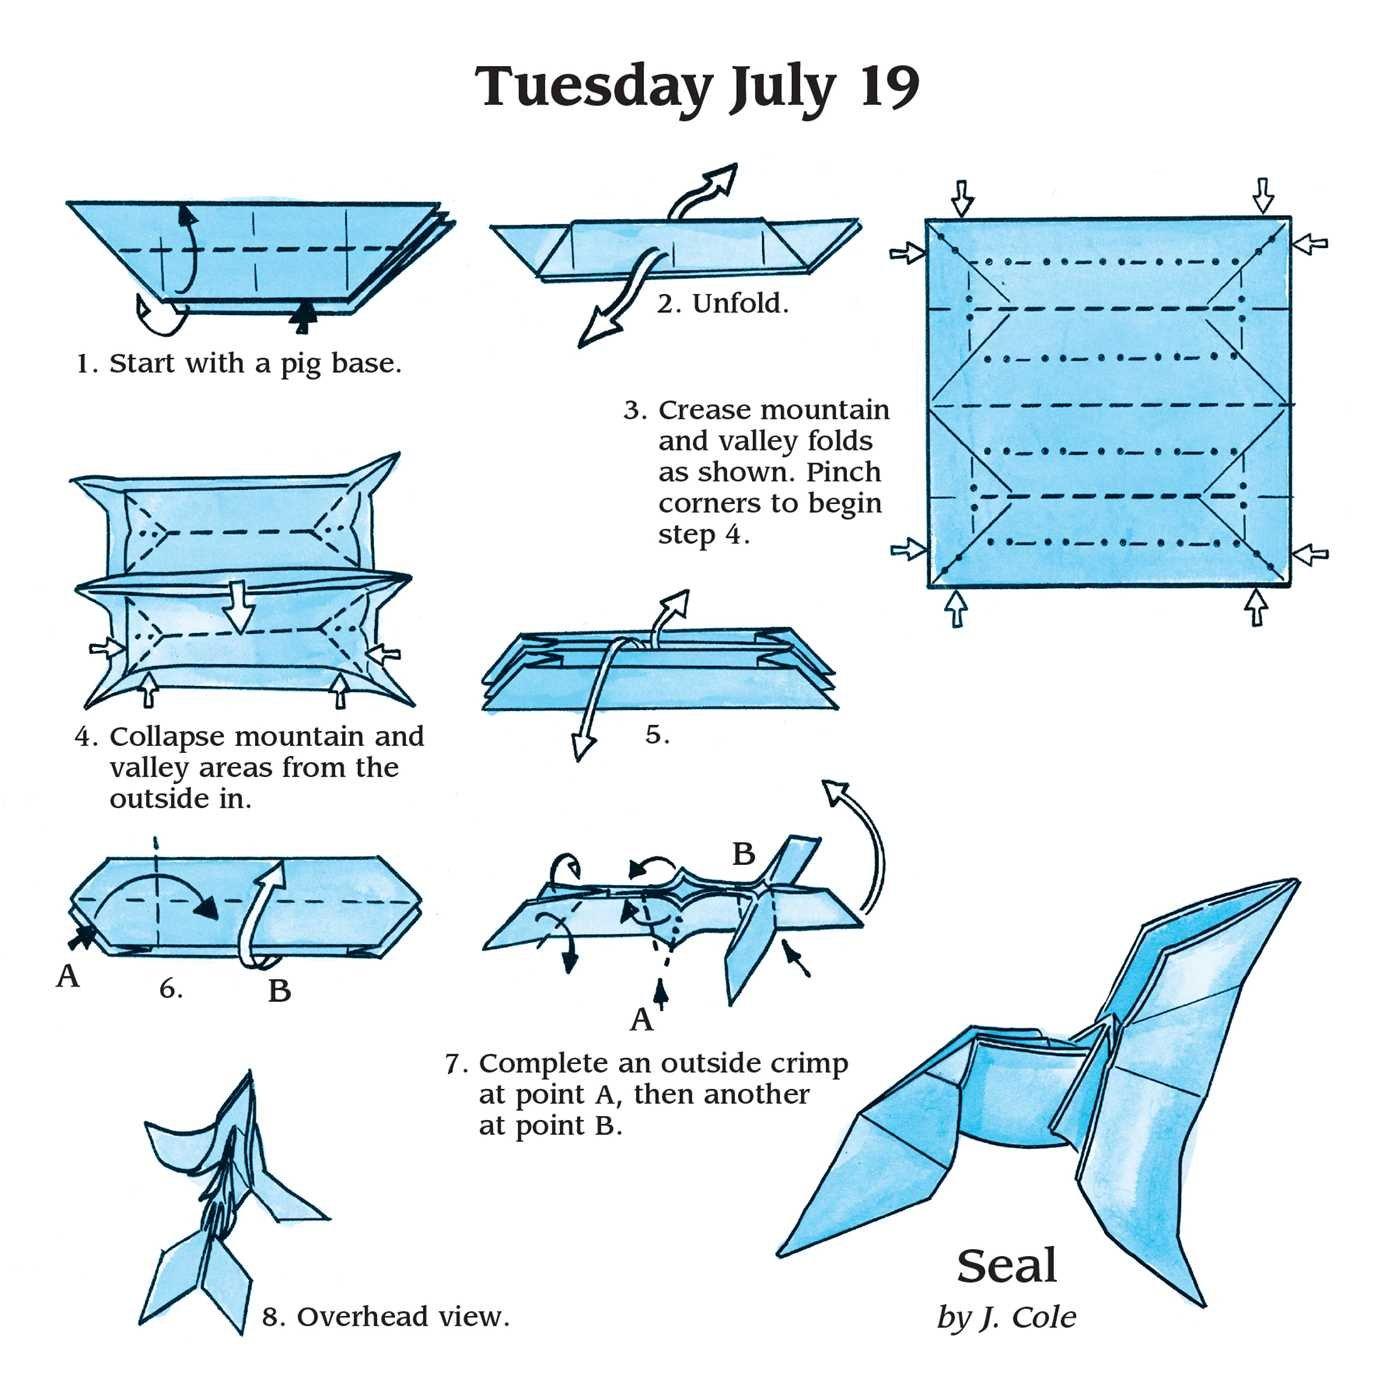 Easy origami fold a day 2016 calendar jeff cole 9781449466473 easy origami fold a day 2016 calendar jeff cole 9781449466473 amazon books jeuxipadfo Gallery